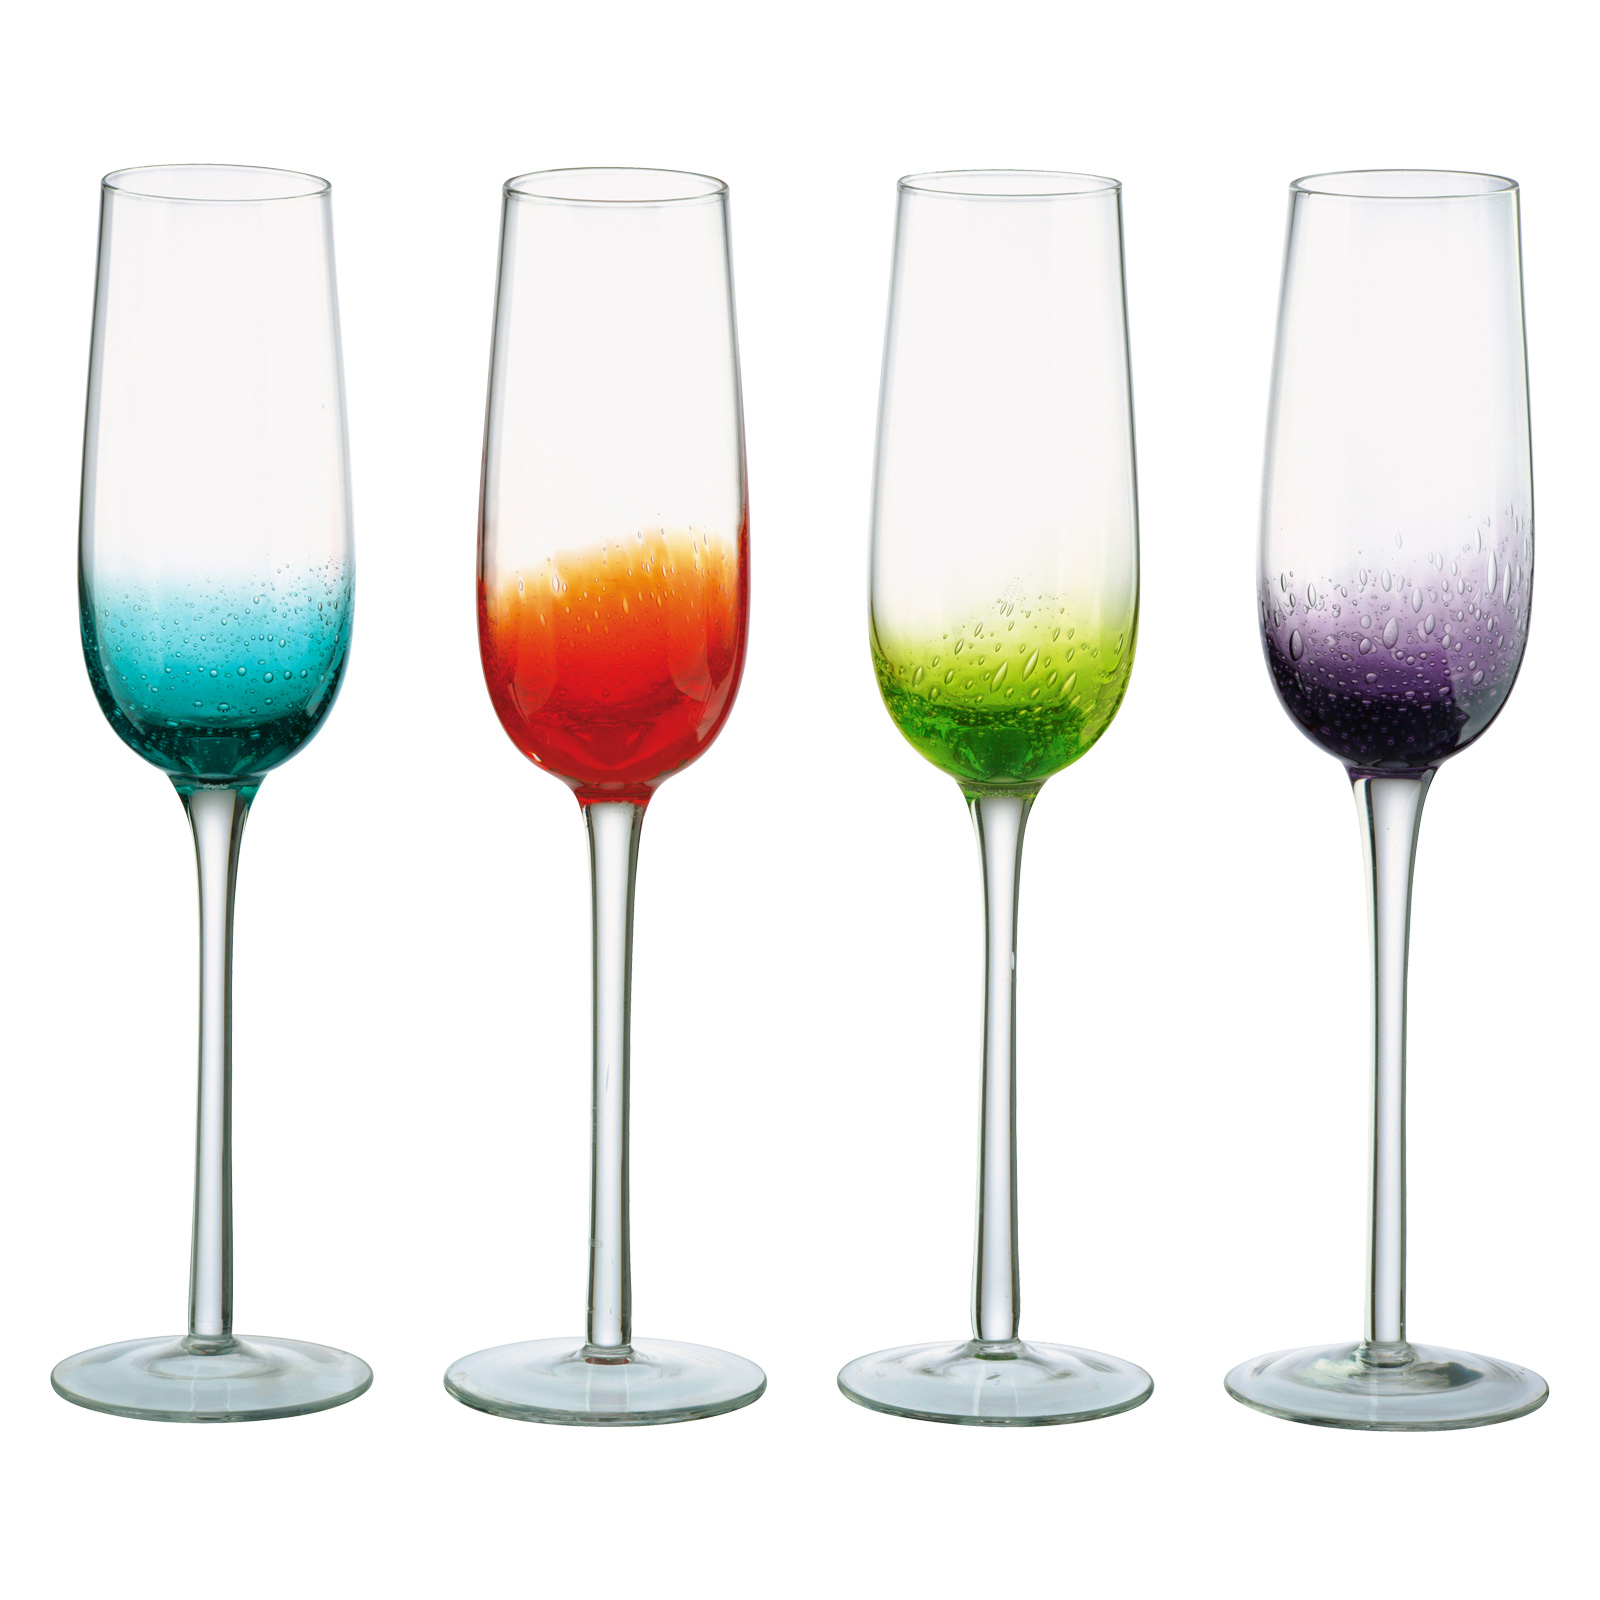 Fizz Champagne Flutes - Set of 4